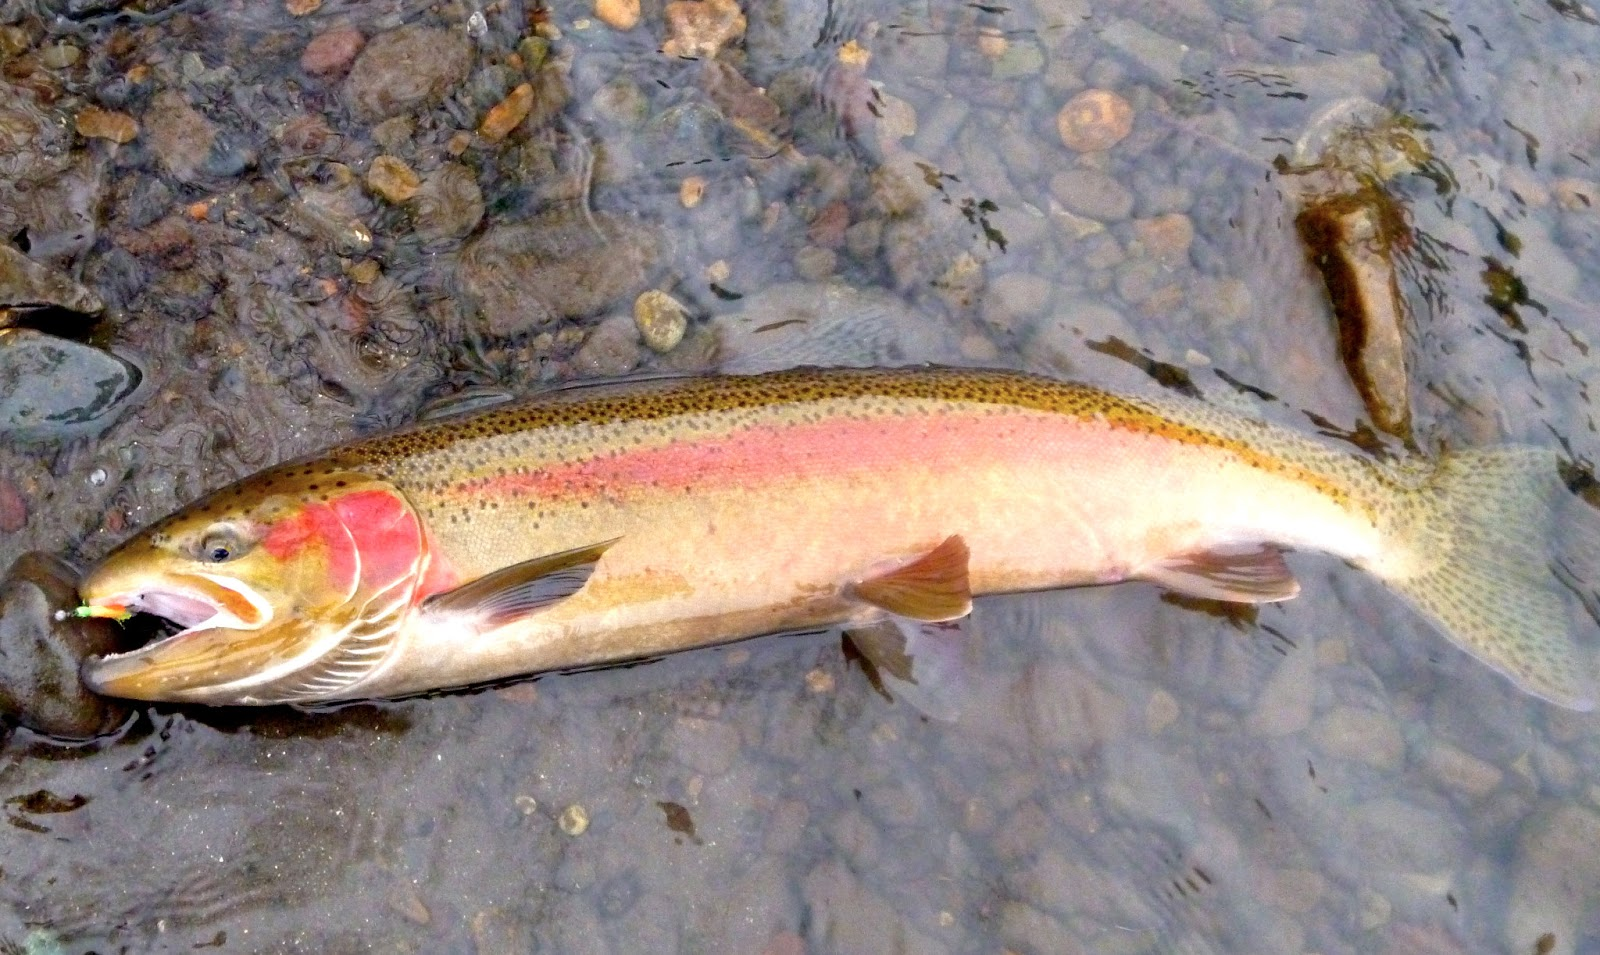 Catching Steelhead on the Wallowa and Grande Ronde - Winding Waters ...